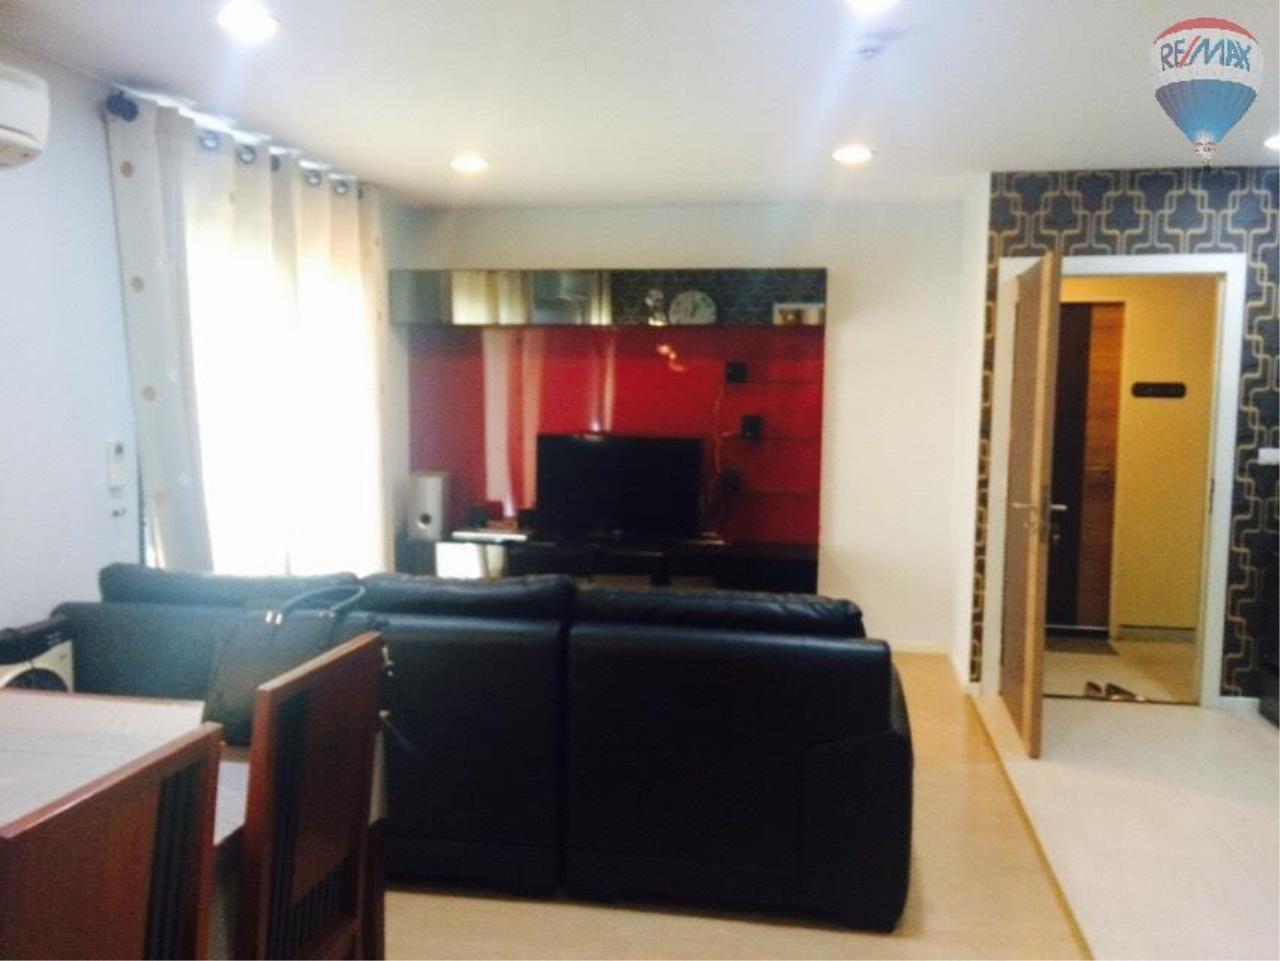 RE/MAX Properties Agency's Condominium for rent 2 bedrooms 92 Sq.m. at Renova Residence 7